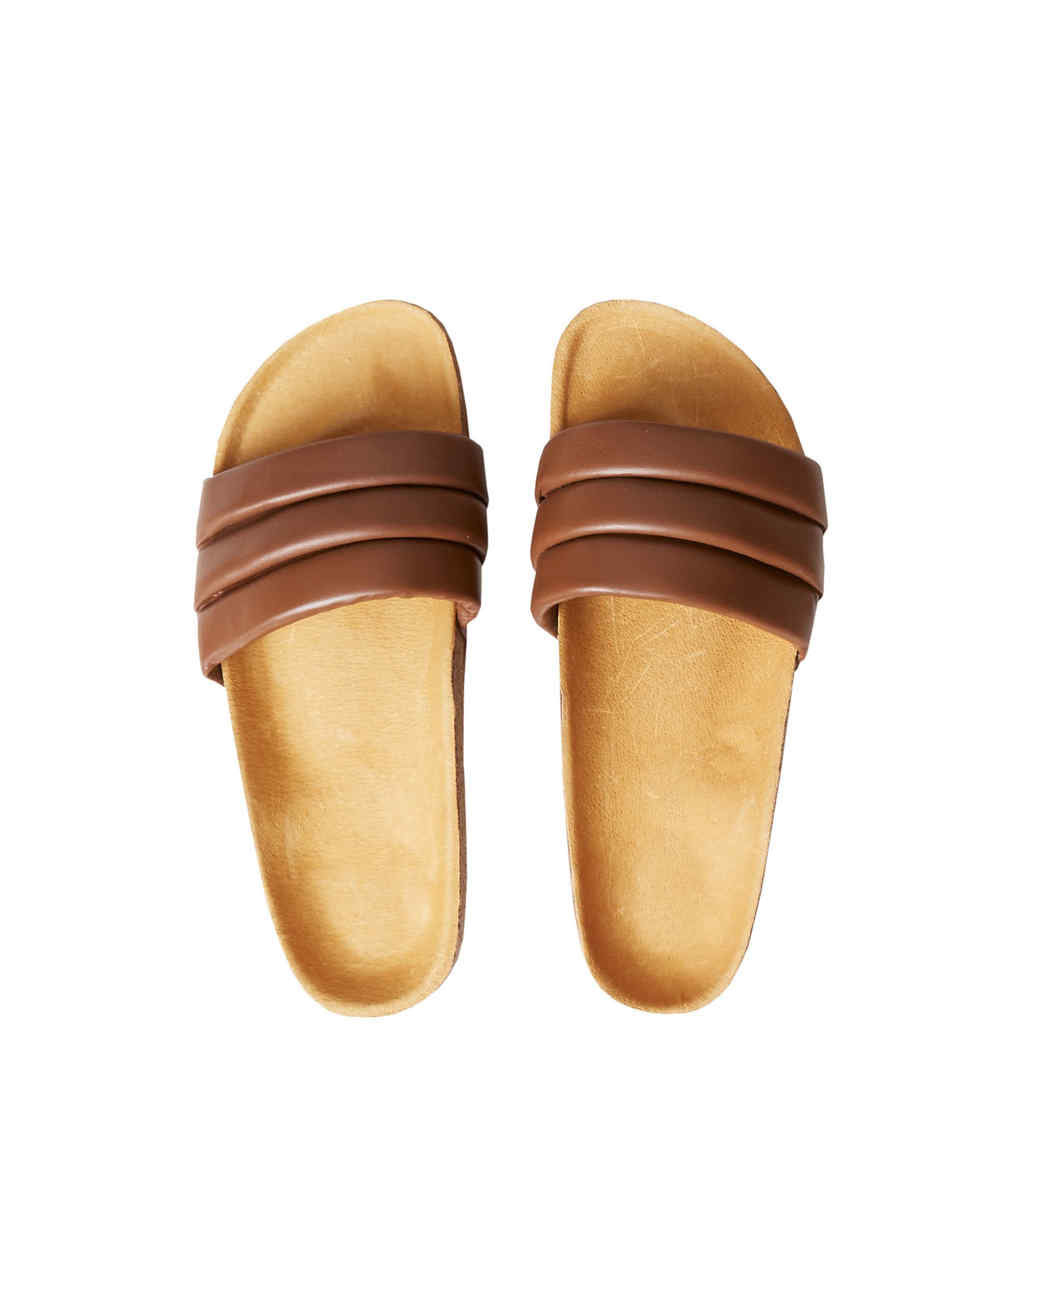 editors-picks-0816-sandals-253-d113014_l.jpg